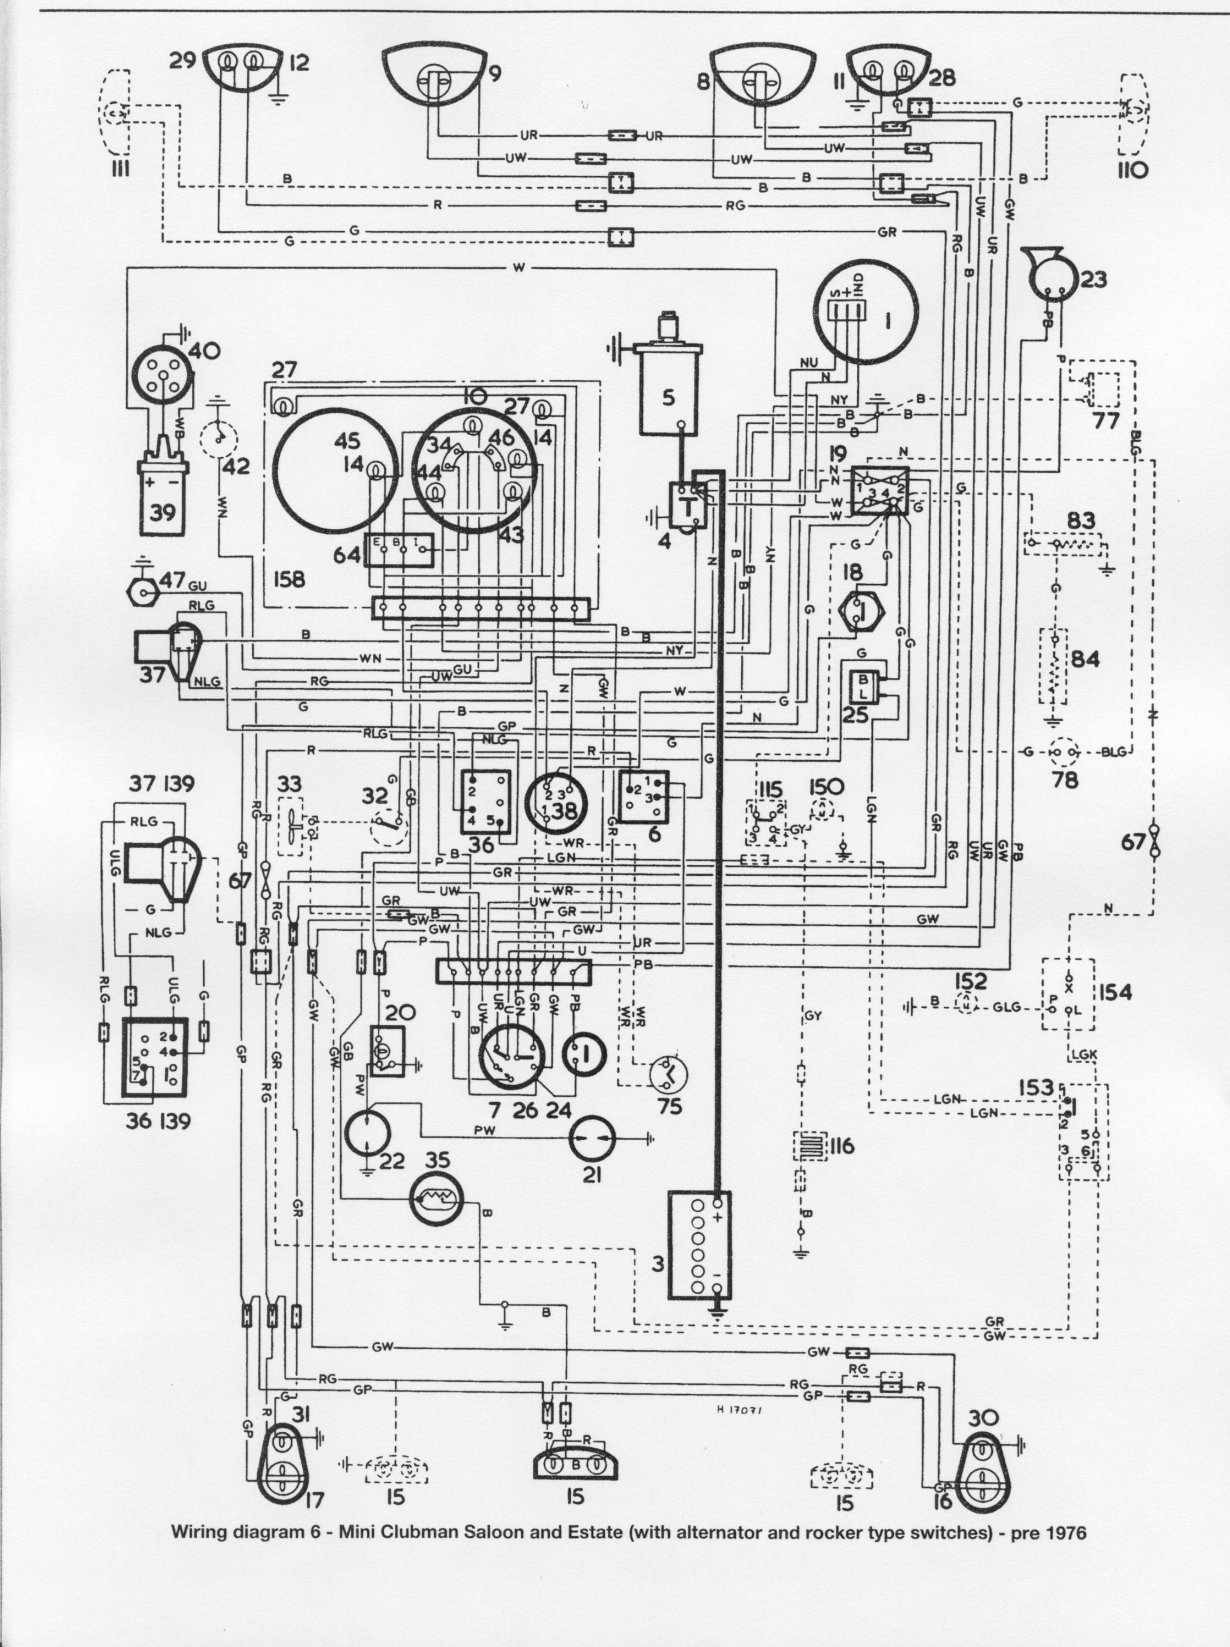 Classic Mini Wiring Diagram Pdf Diagrams Electrical Residential Rover Anything U2022 Rh Optionfire Co 1999 Club Car 48v Electric Golf Cart